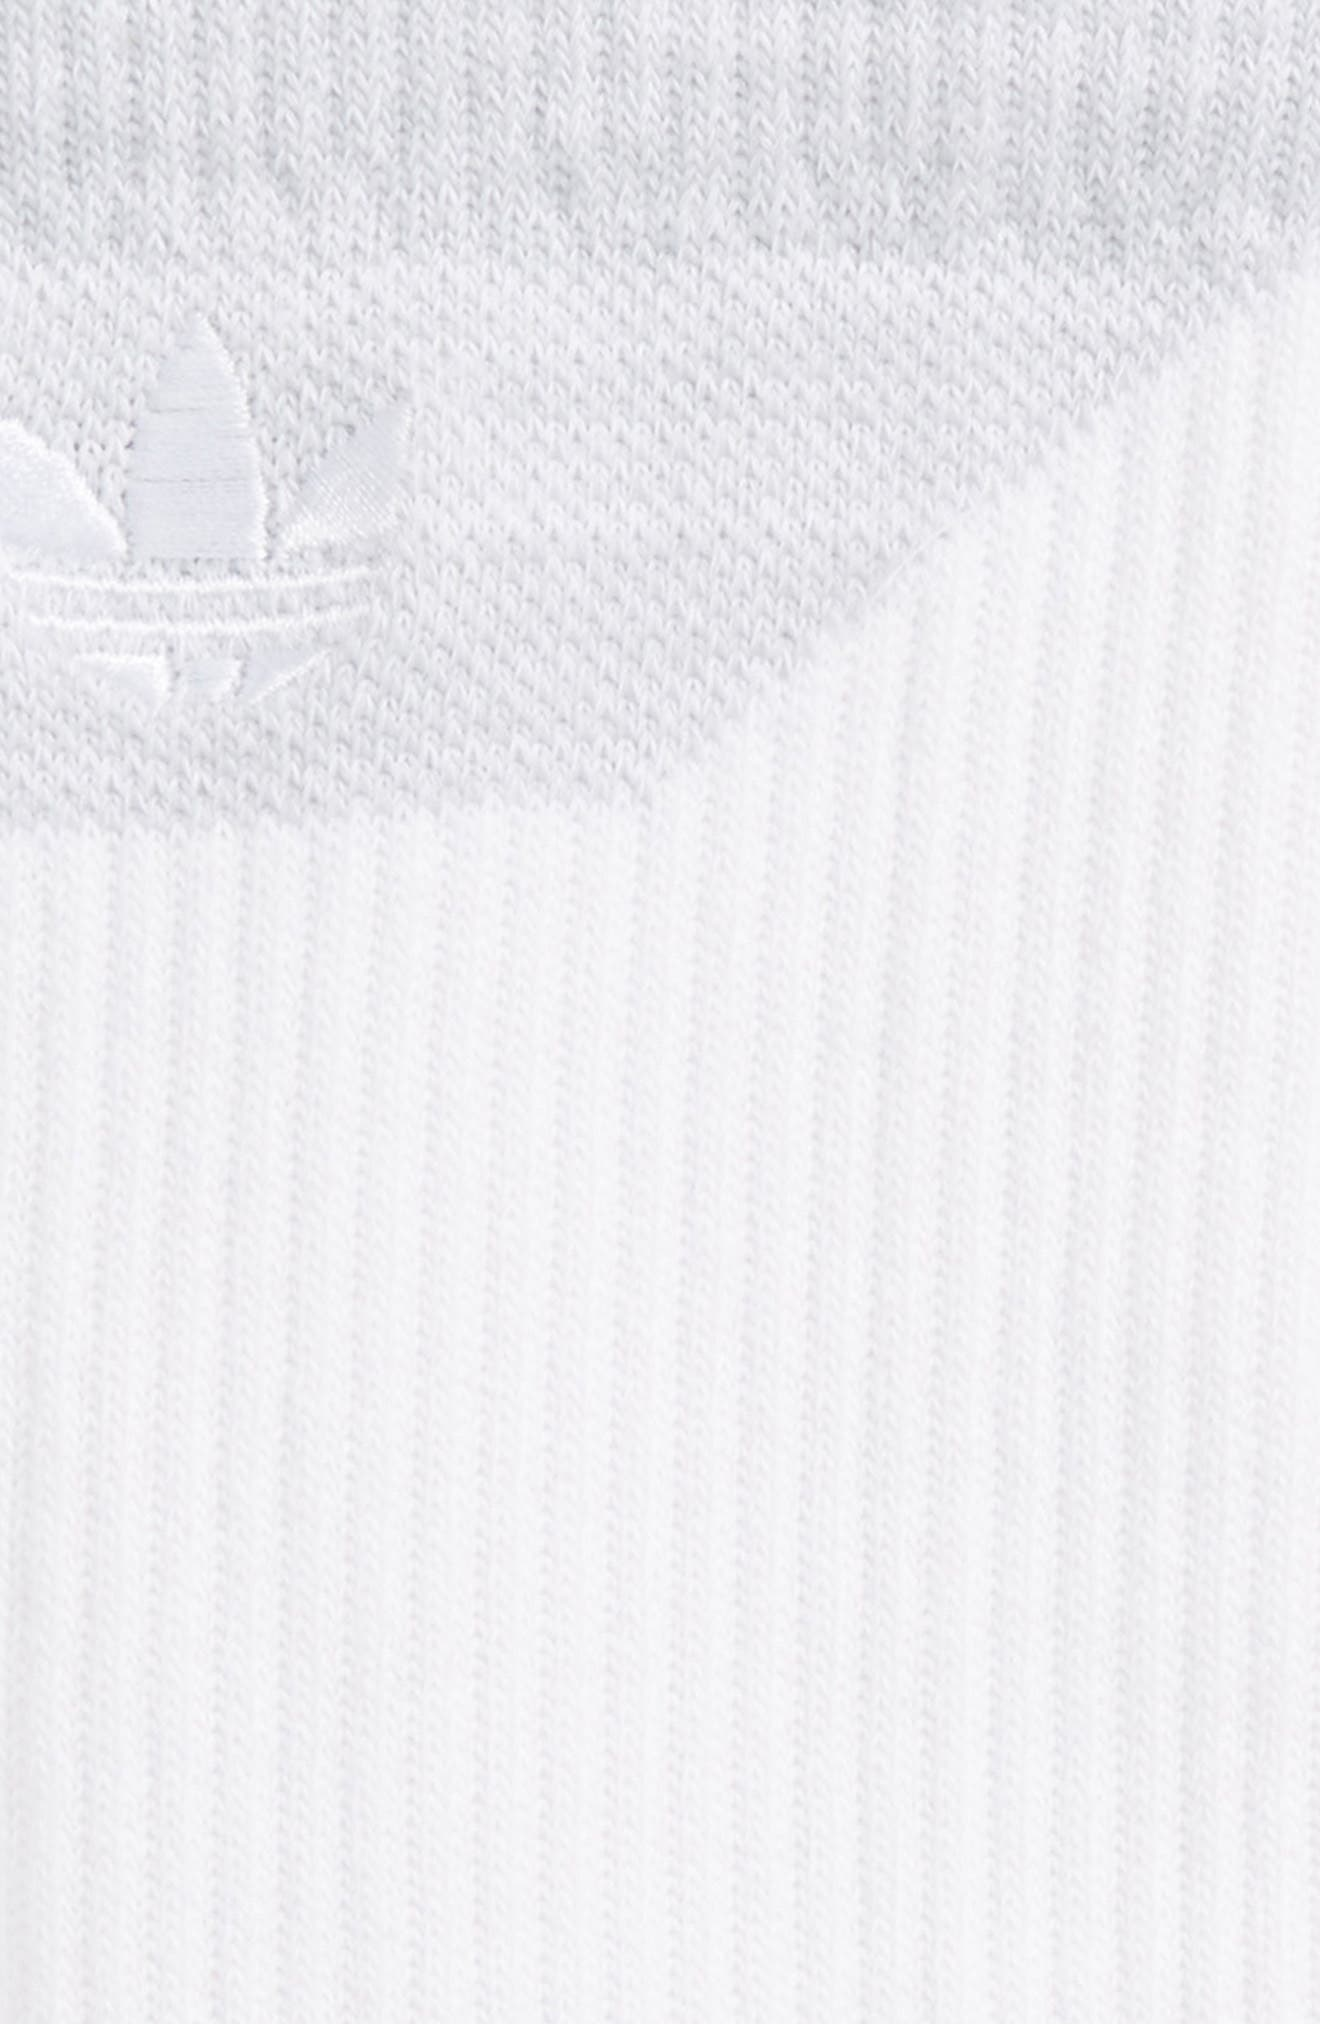 NMD Socks,                             Alternate thumbnail 2, color,                             White/ Clear Onyx Space Dye